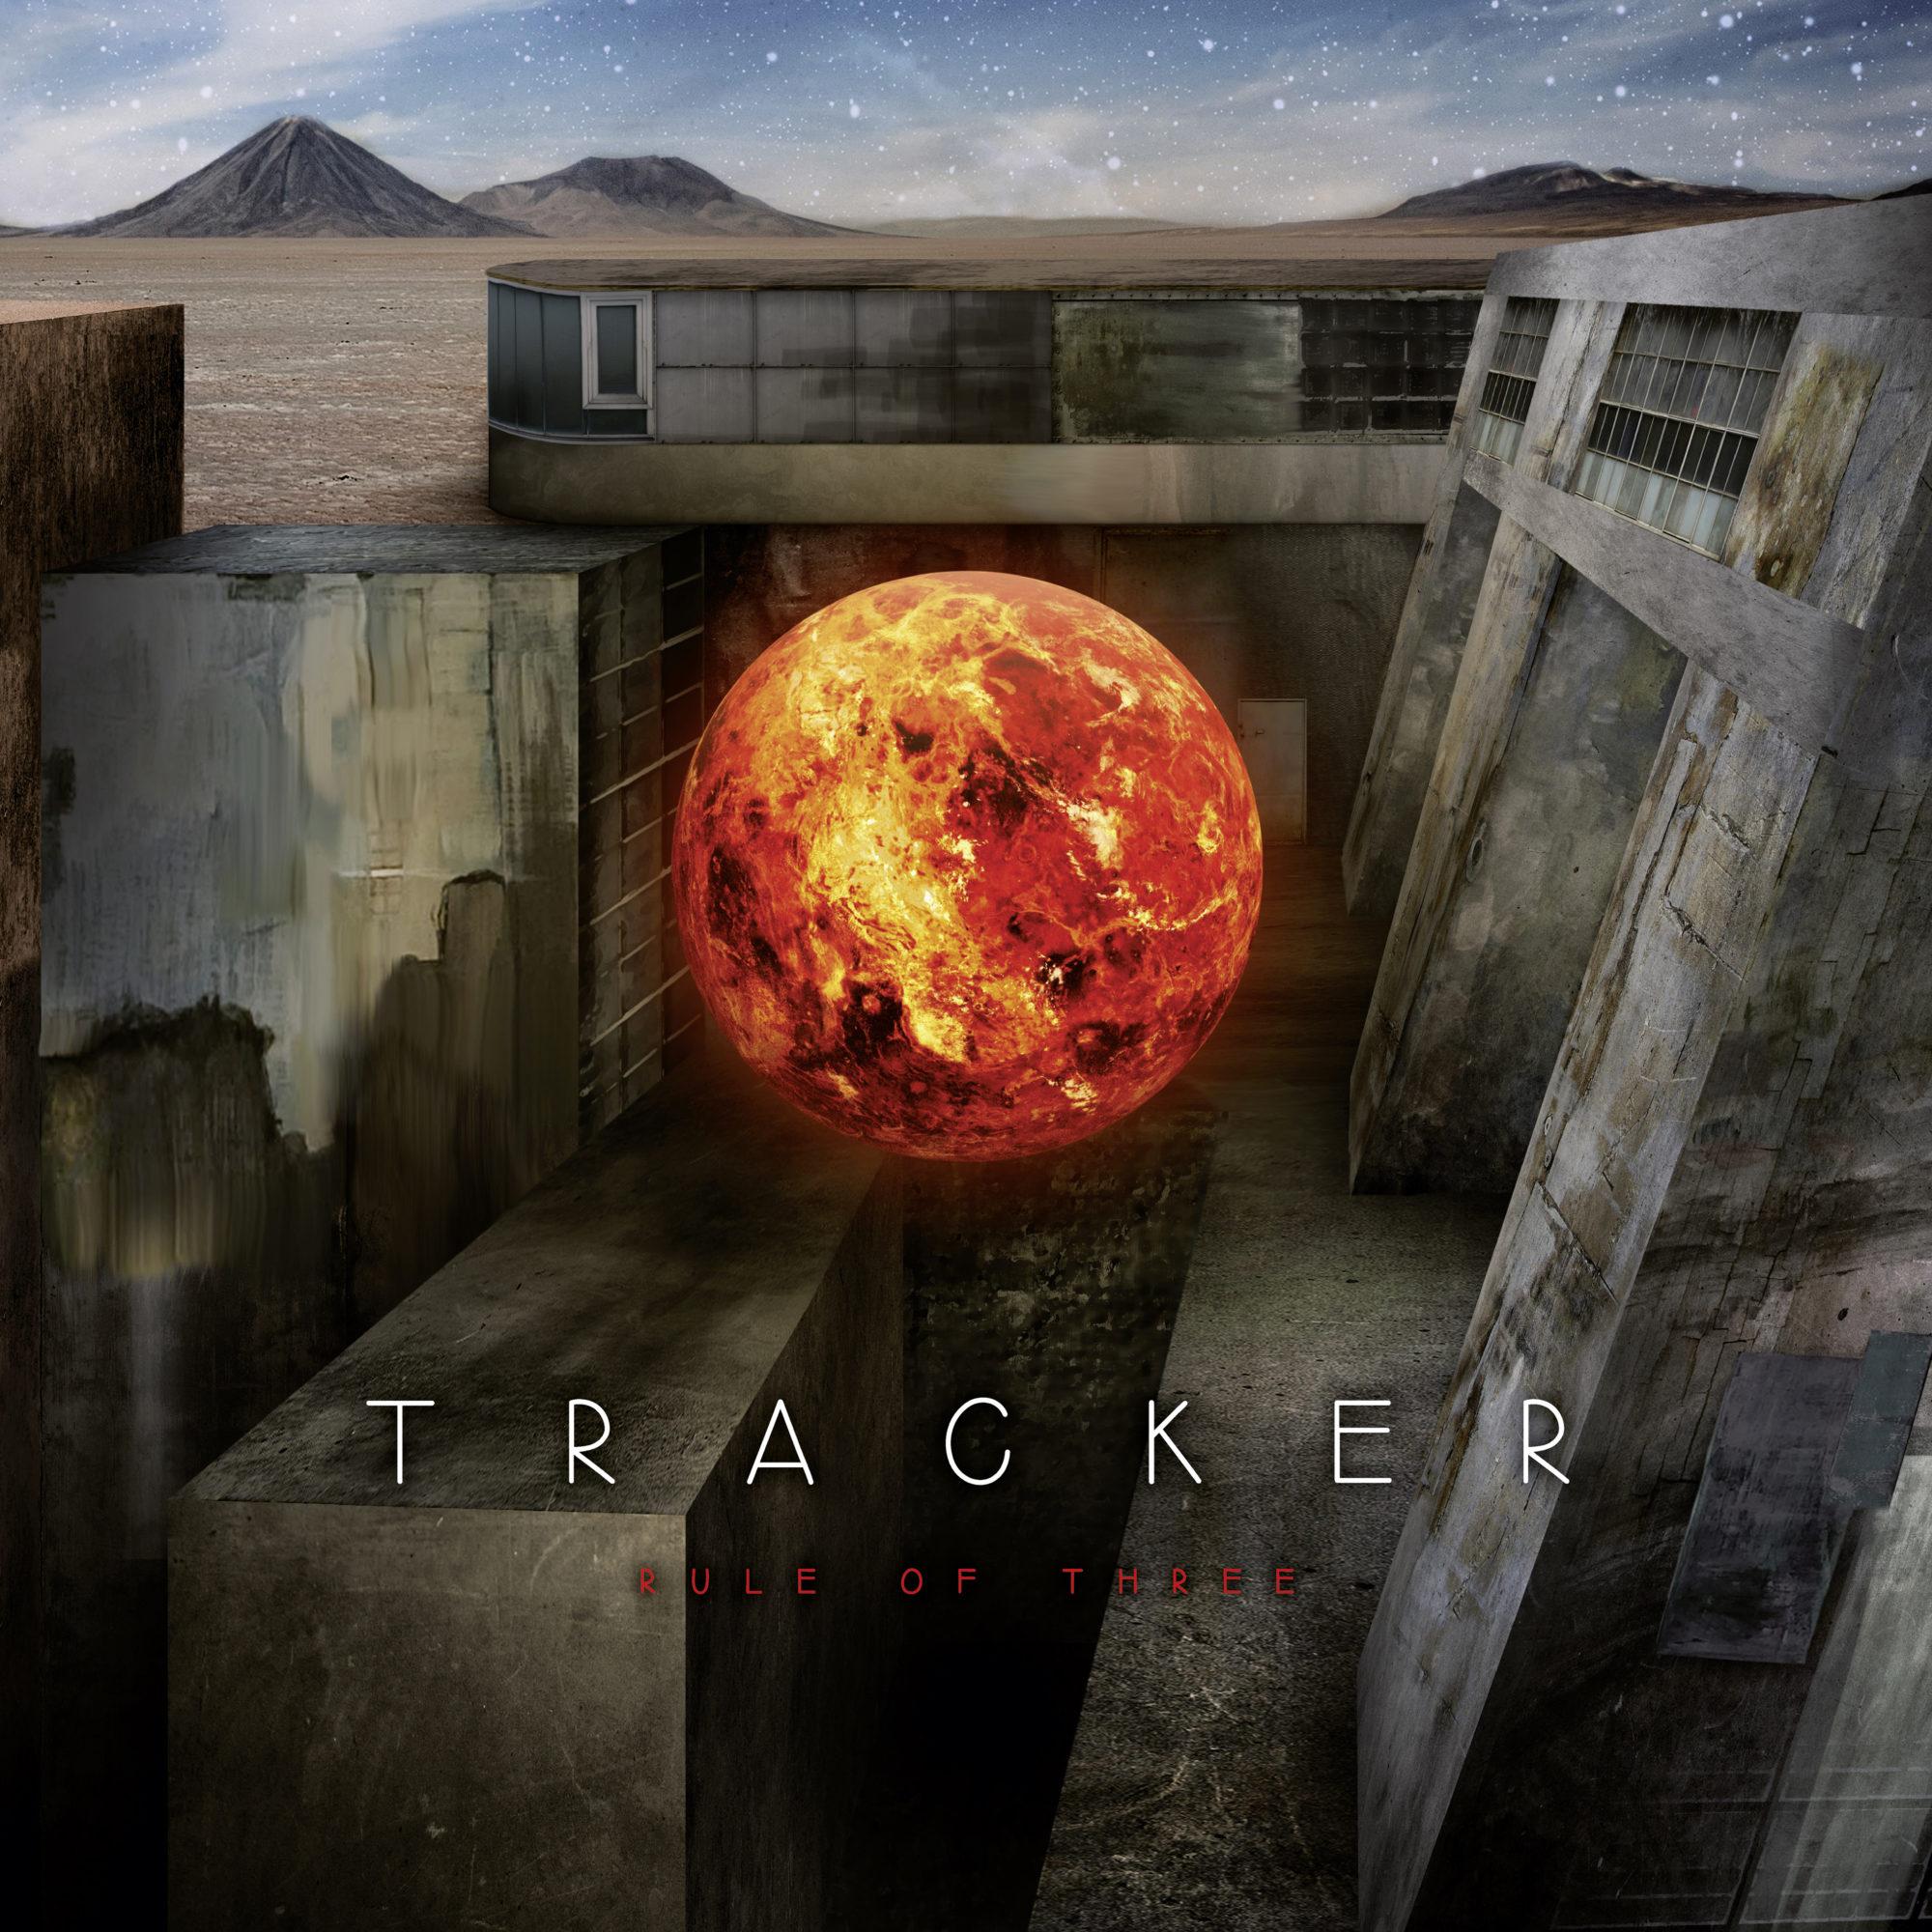 Tracker Band Music Rule of Three Album Cover Artwork Austria